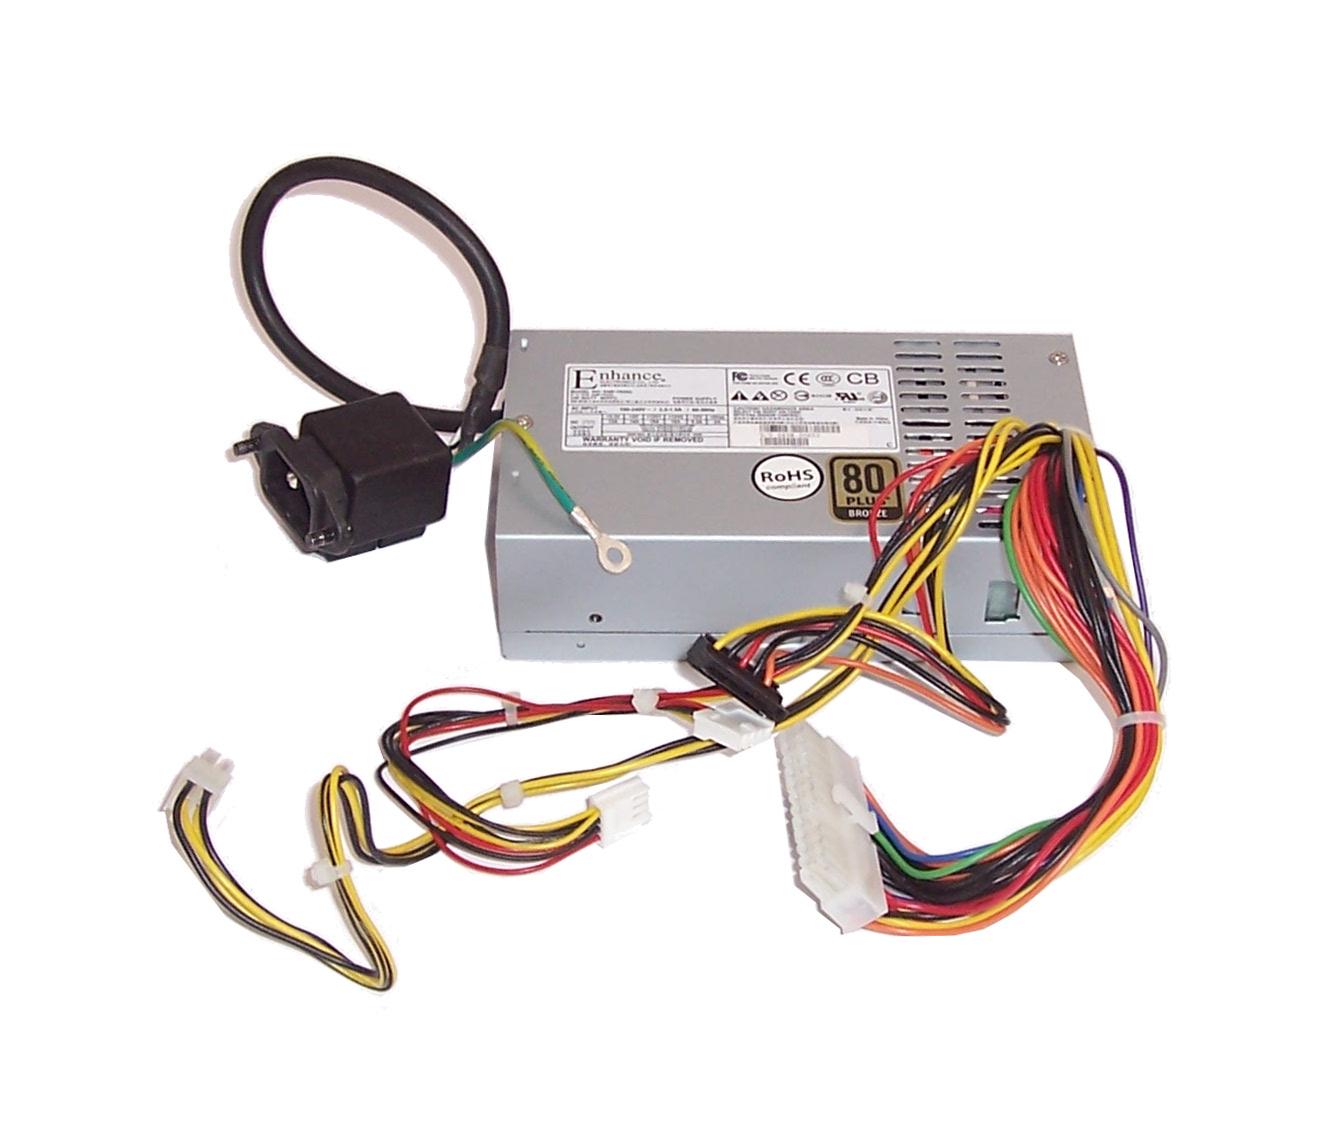 Enhance ENP-7025C 250W 24-Pin Mini-ITX Power Supply For IEC C13 Socket